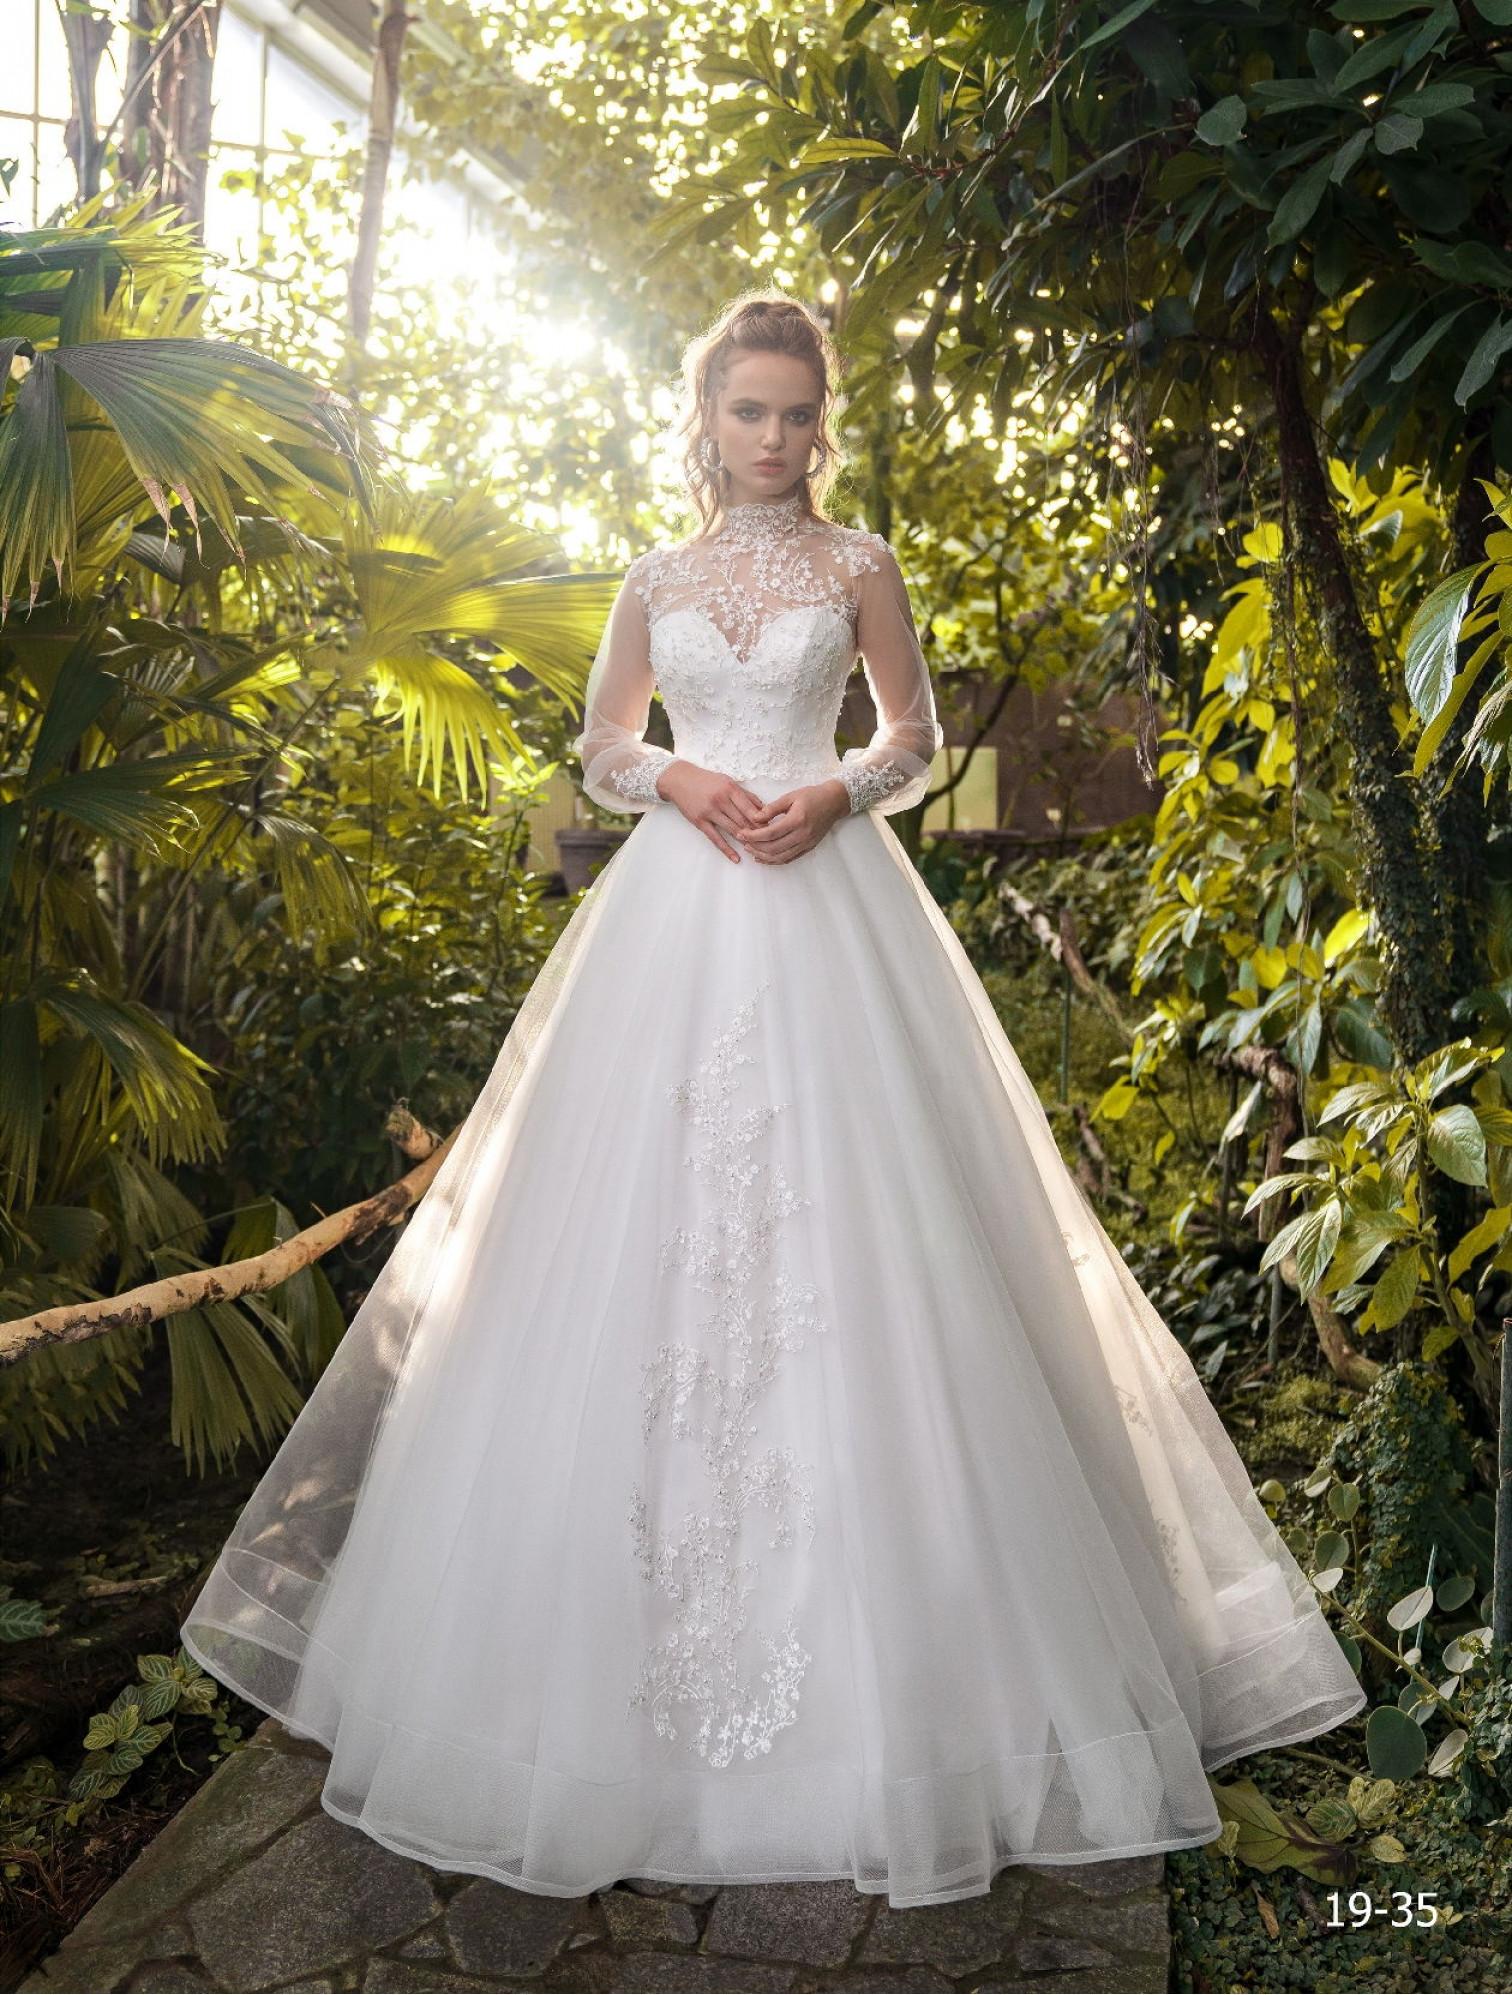 Wedding dress 19-35